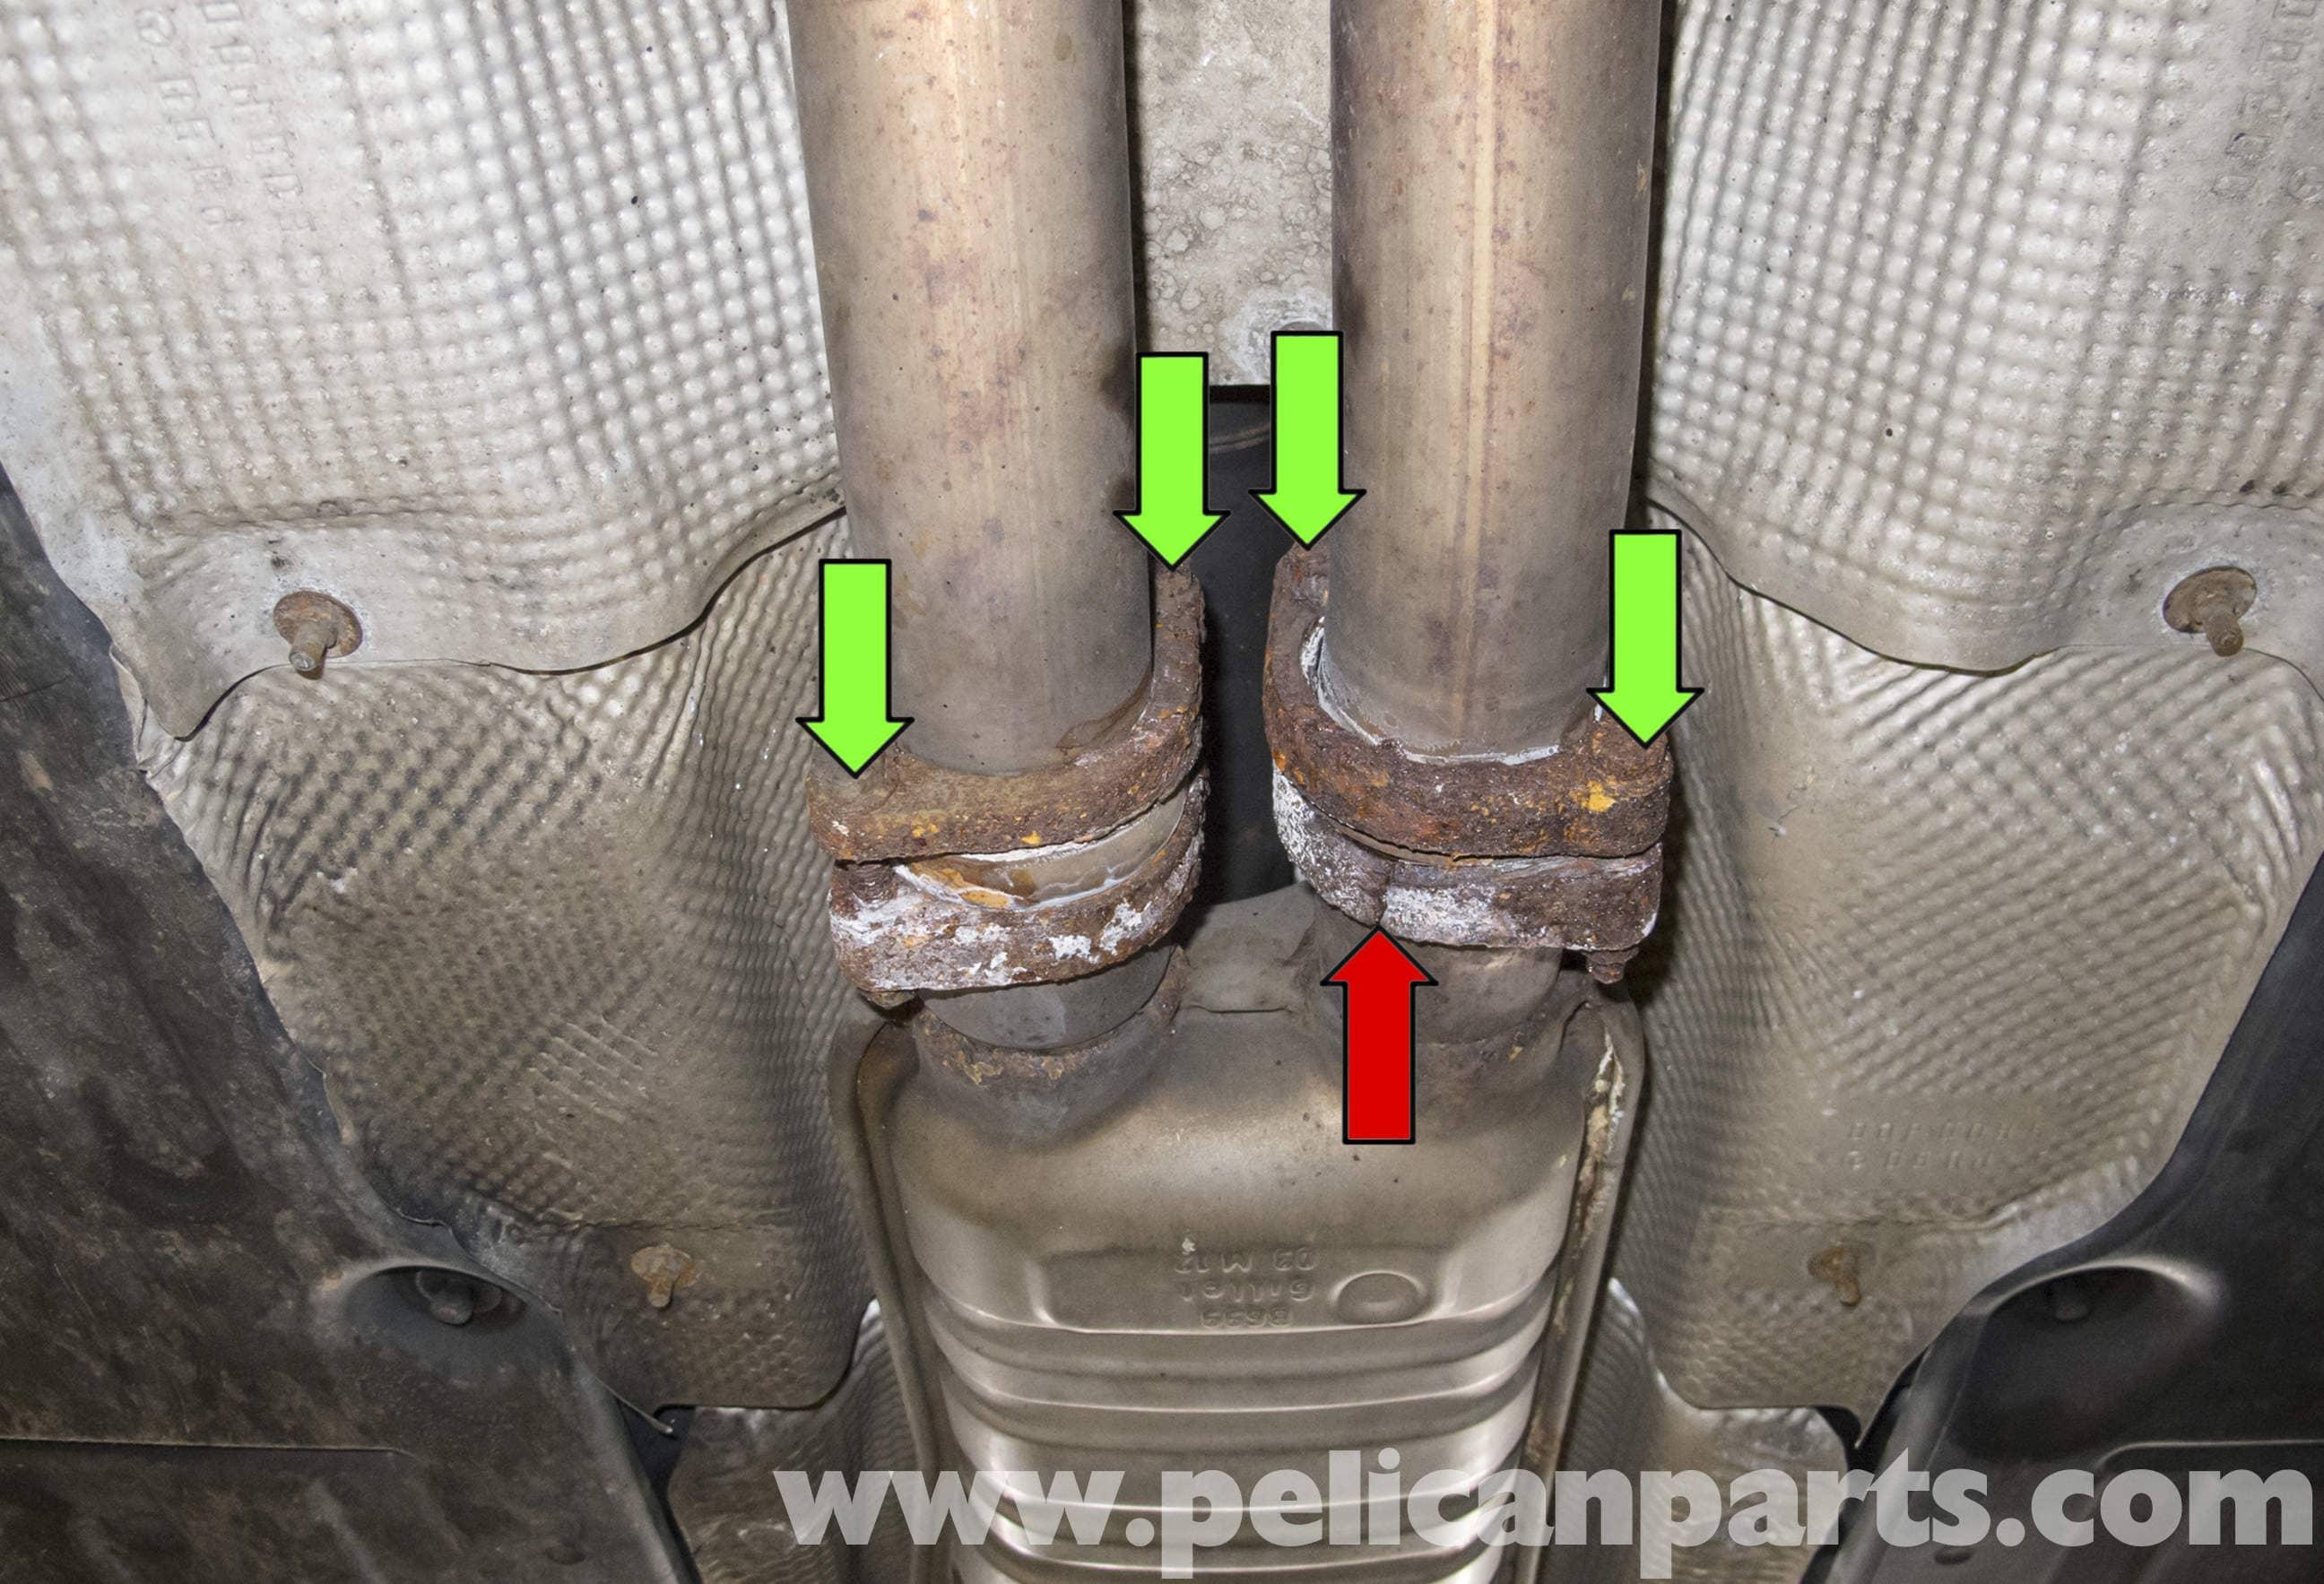 Oxygen Sensor Replacement >> Mercedes-Benz W211 Exhaust System Replacement (2003-2009) E320 | Pelican Parts DIY Maintenance ...